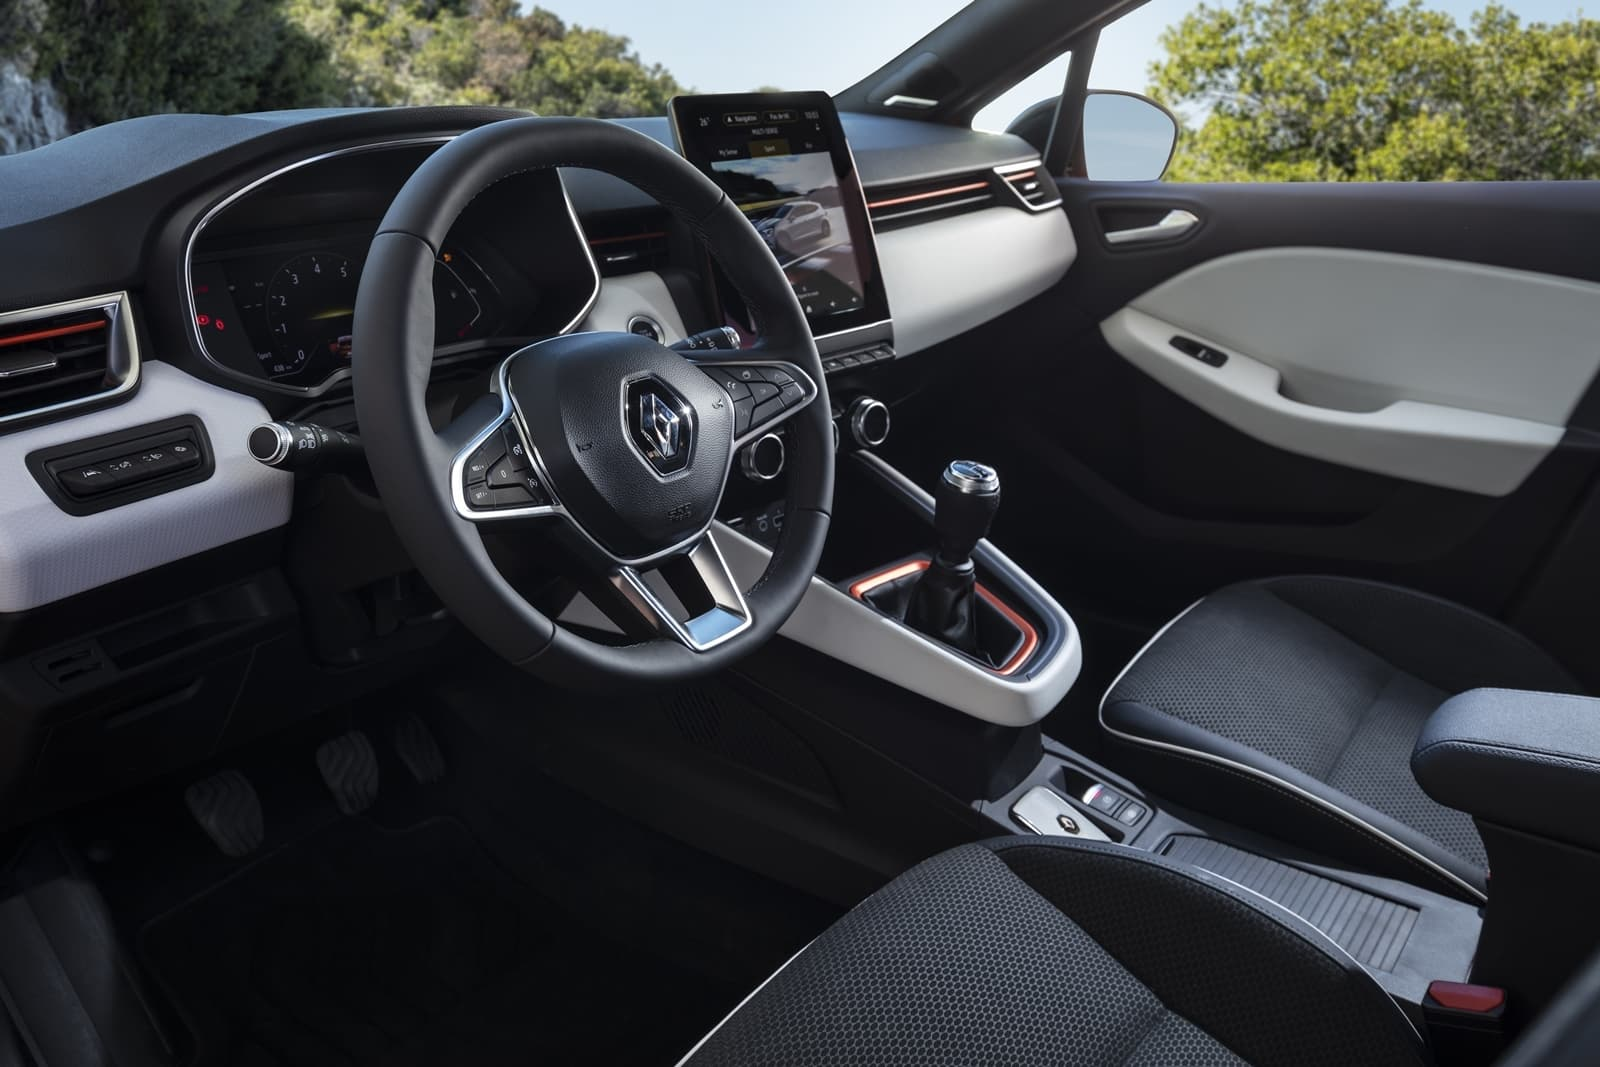 Renault Clio 2020 Prueba 0619 019